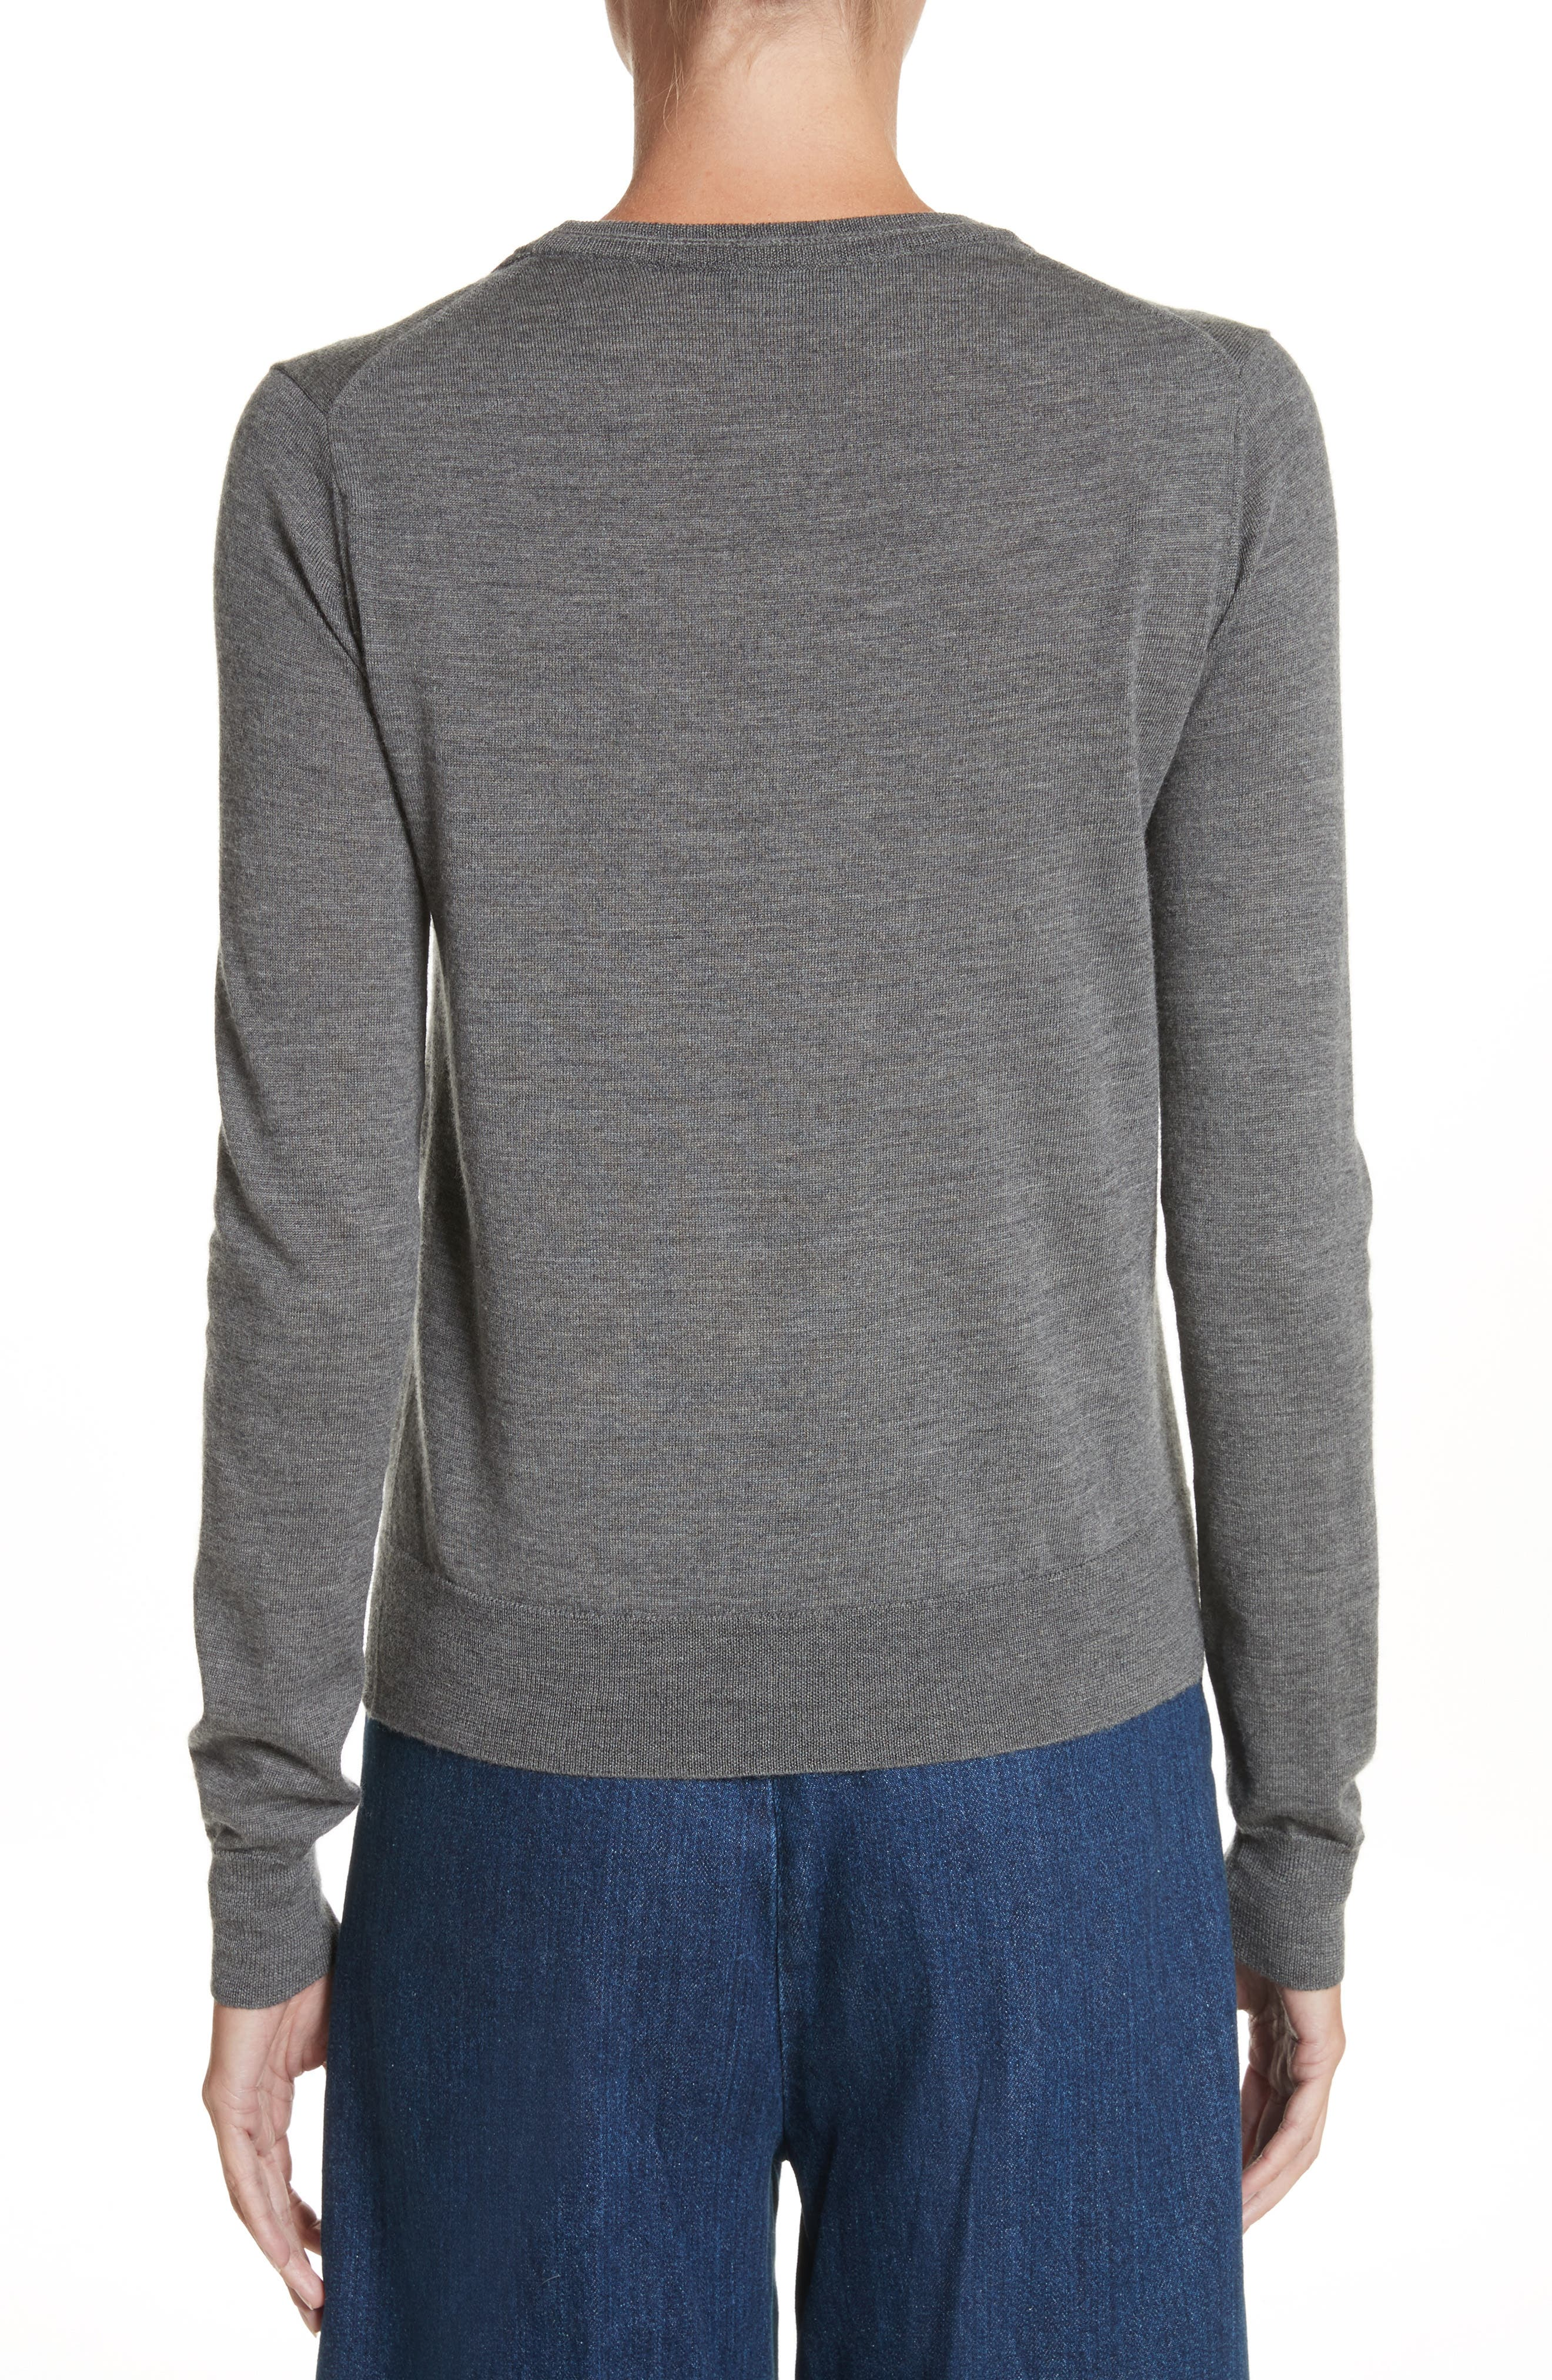 Ruffle Merino Wool Sweater,                             Alternate thumbnail 2, color,                             Dark Grey Melange